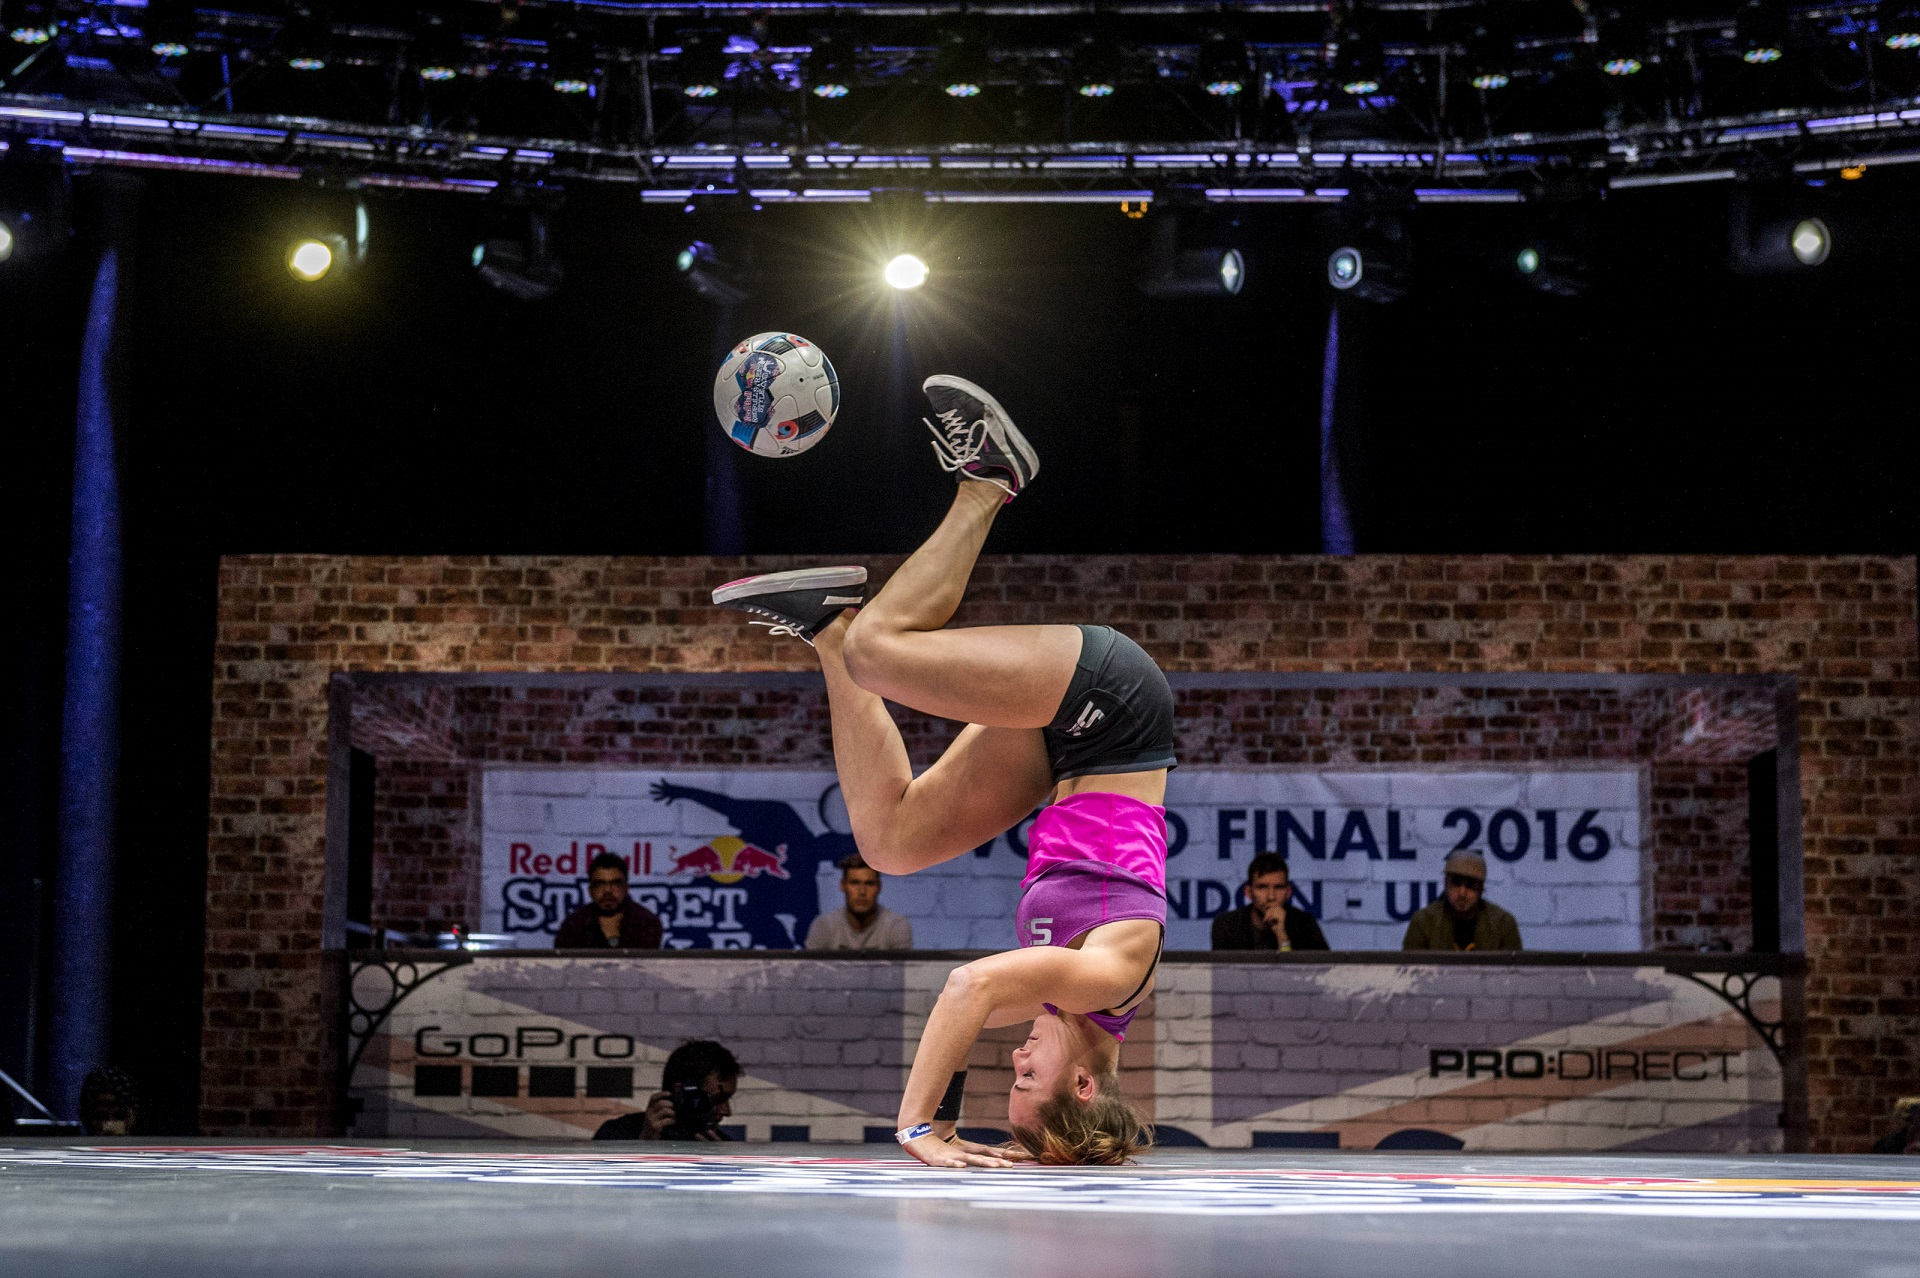 Melody Donchet podczas Red Bull Street Style w Londynie